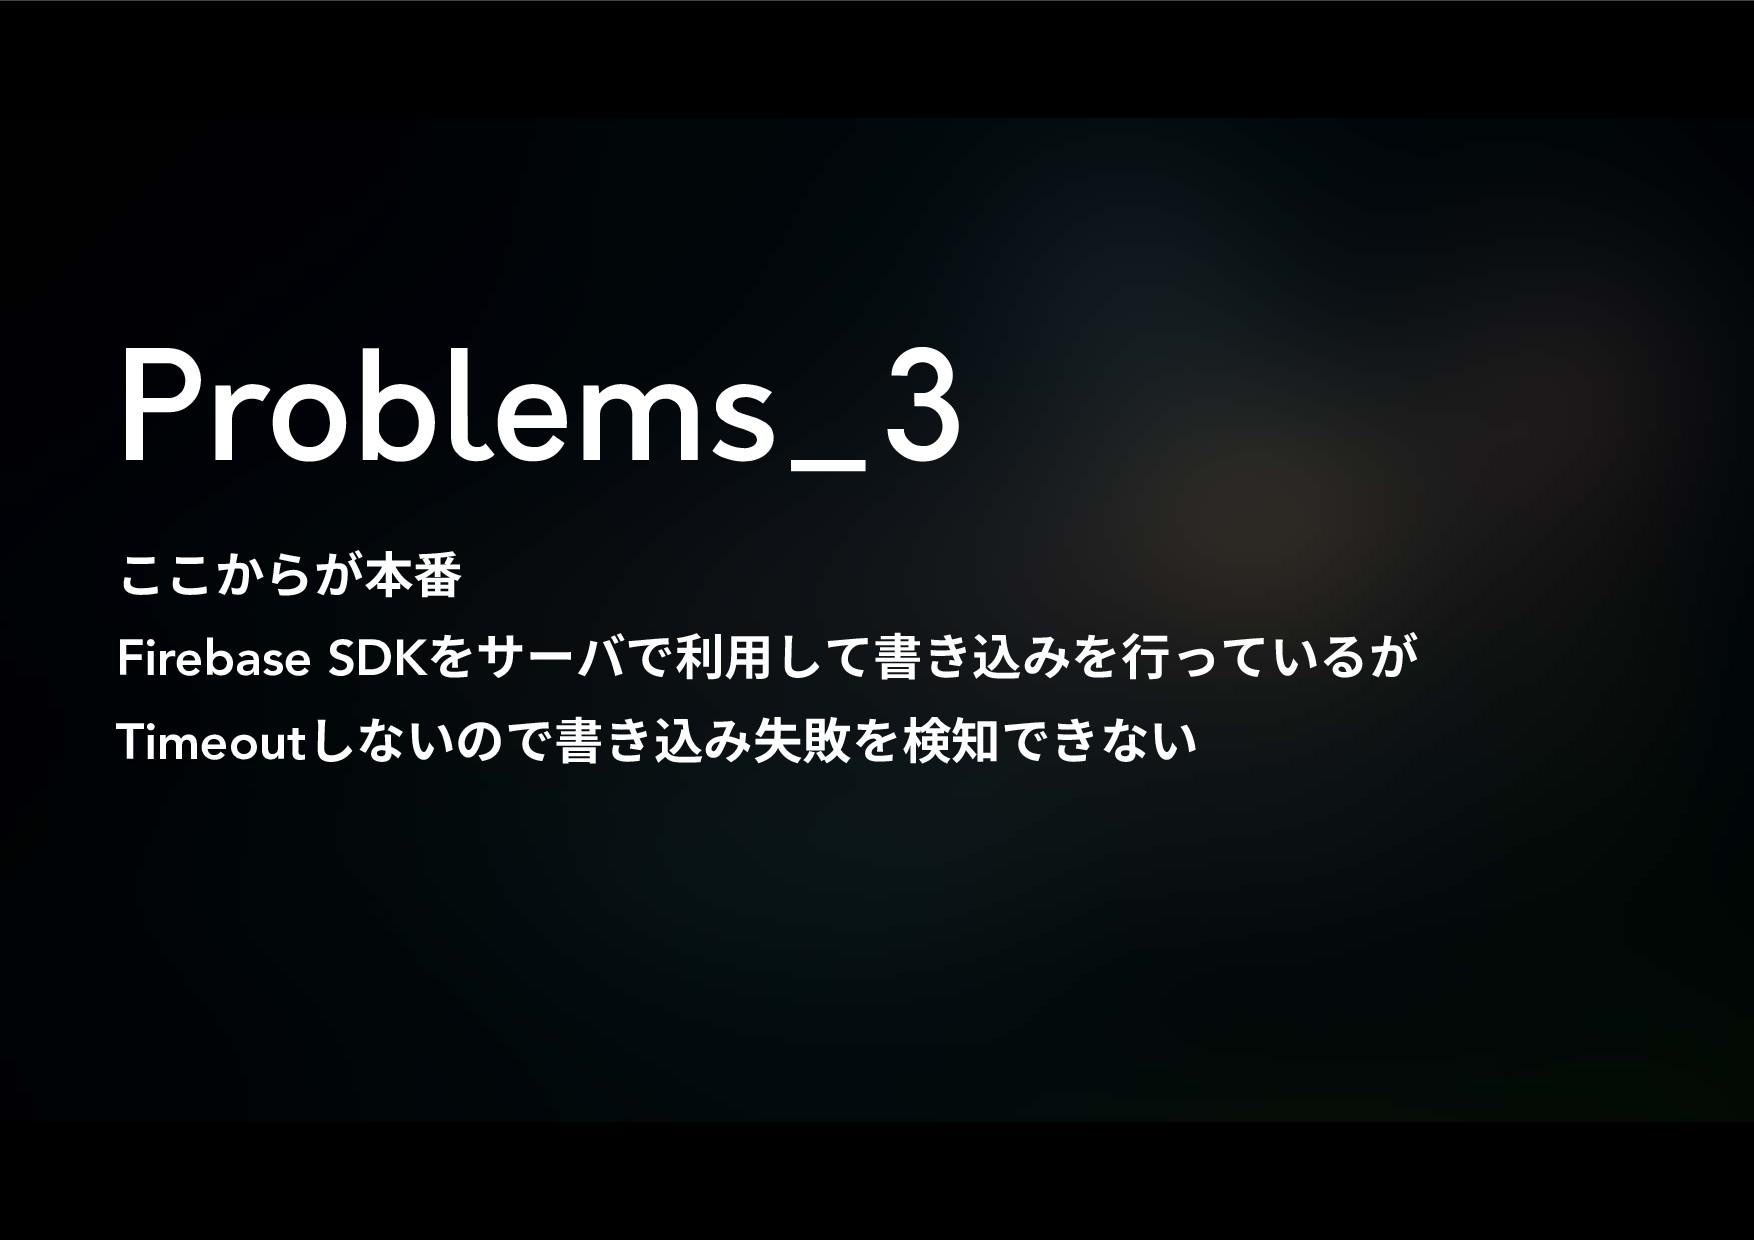 Problems_3 ַָֿֿ劤殢 Firebase SDK؟٦غדⵃ欽׃ג剅ֹ鴥遤...